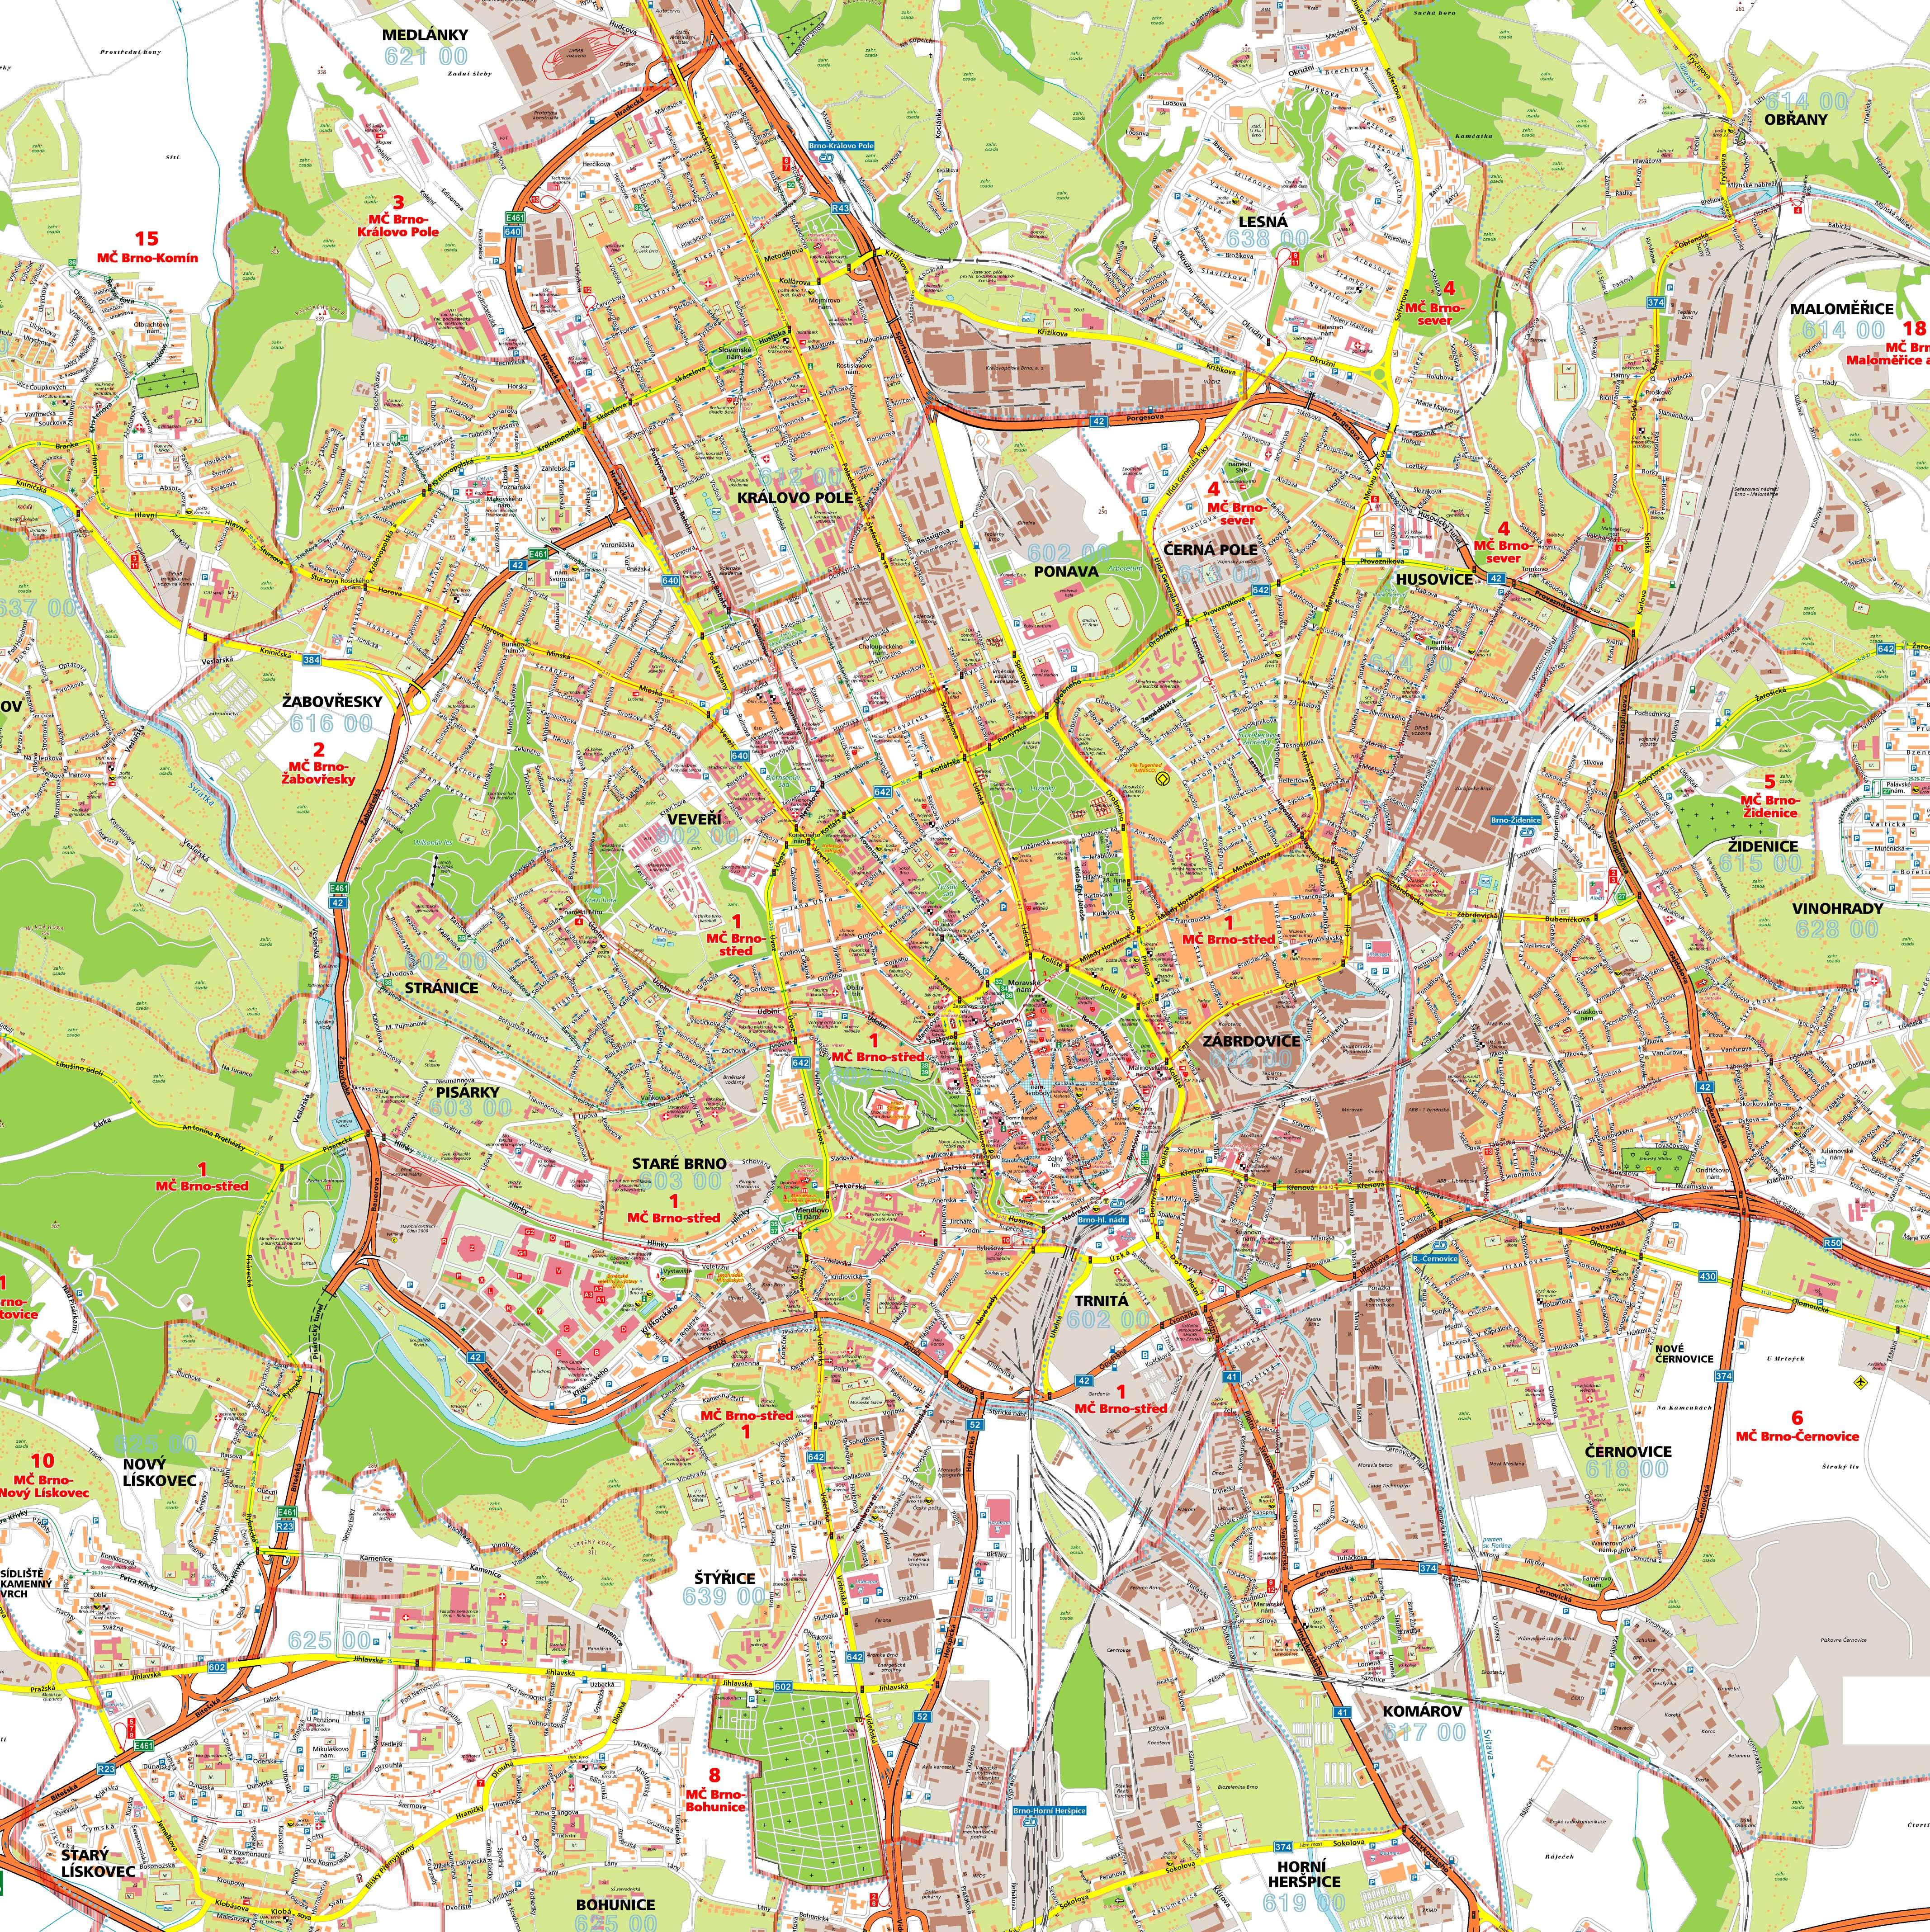 Brno Czech Republic  city pictures gallery : Brno Tourist Map Brno Czech Republic • mappery